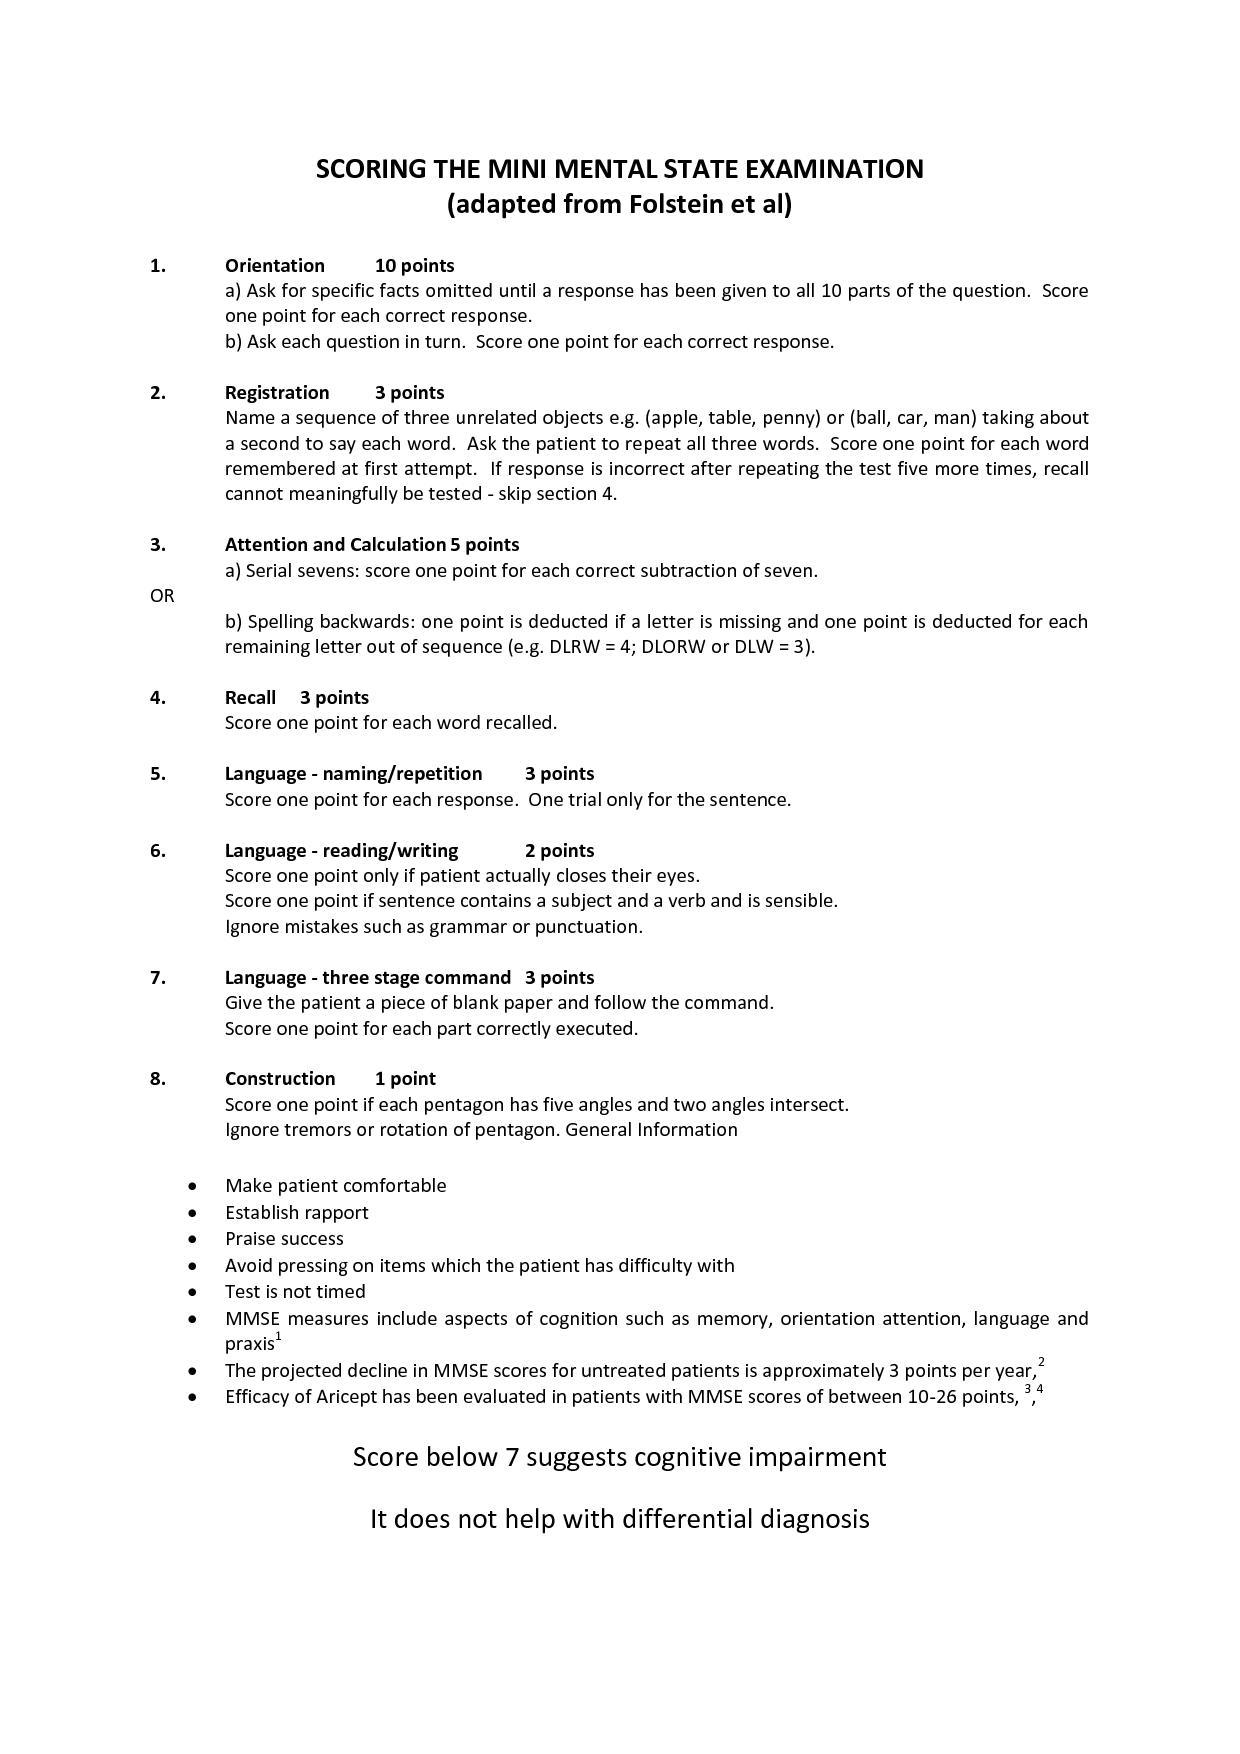 Von mental status exam oriented mar 2016 b cher verkaufen folstein mini mental status exam form printable screening tool the mini mental state examination